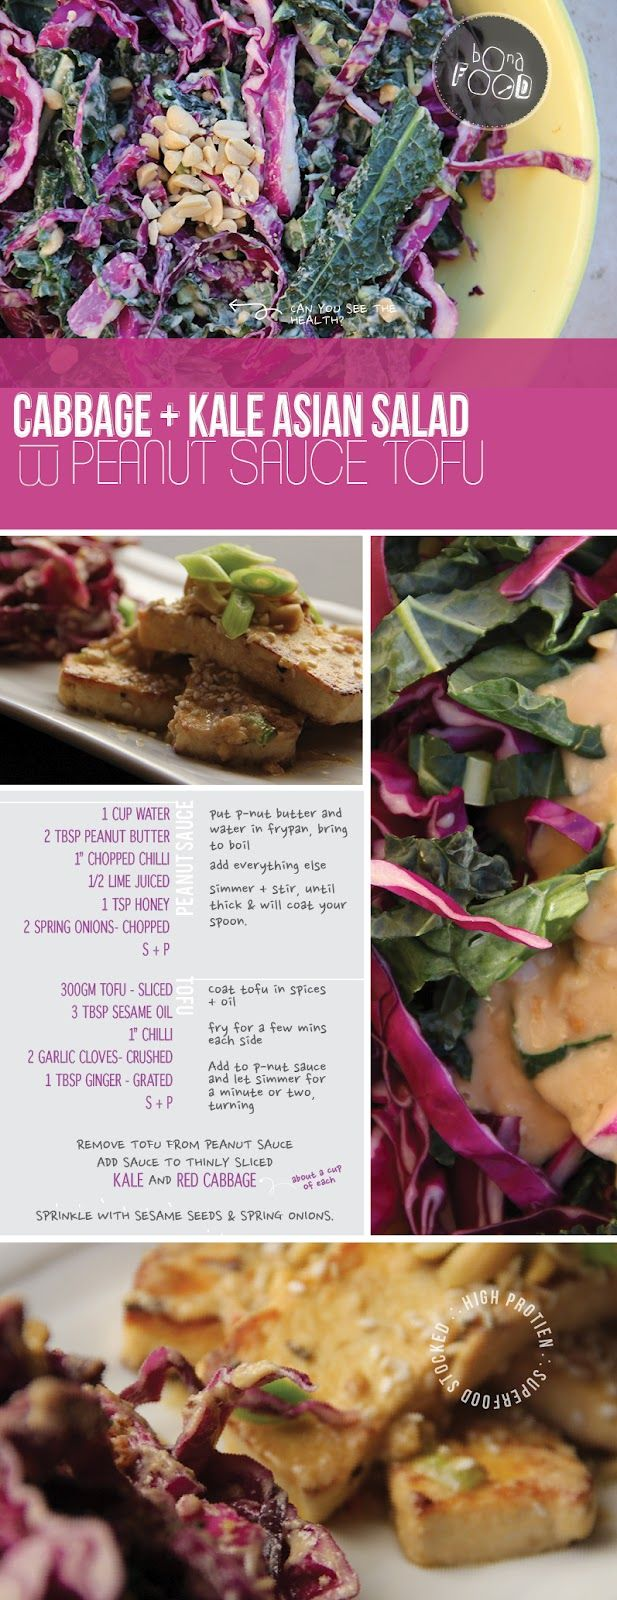 bona food: Cabbage + Kale Asian Salad with Peanut Sauce Tofu